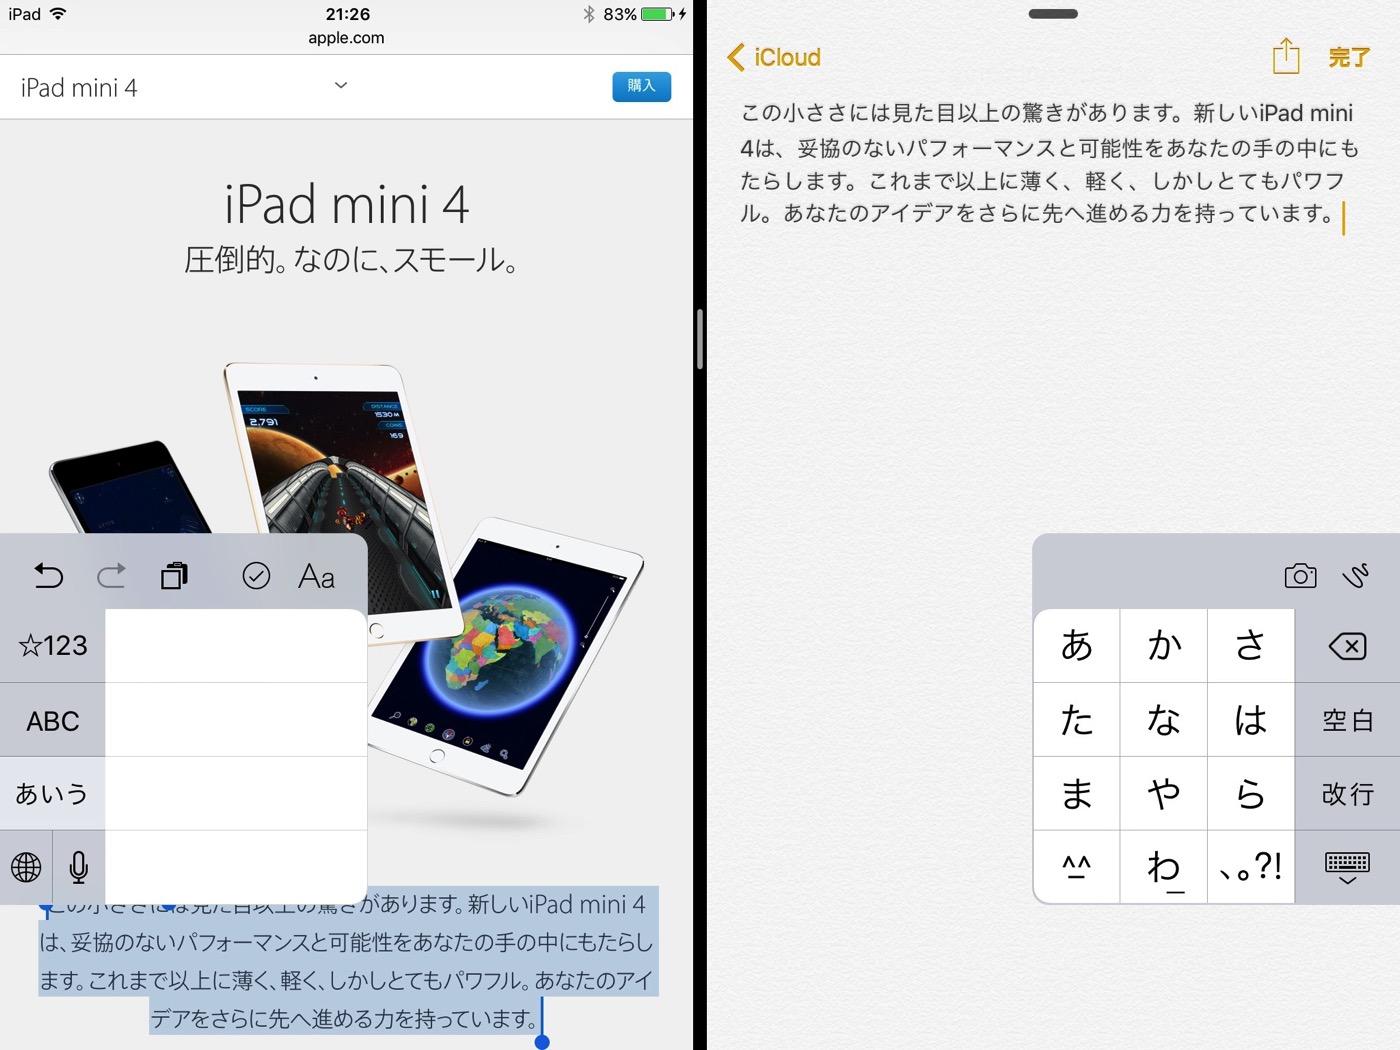 iPad mini 4-24